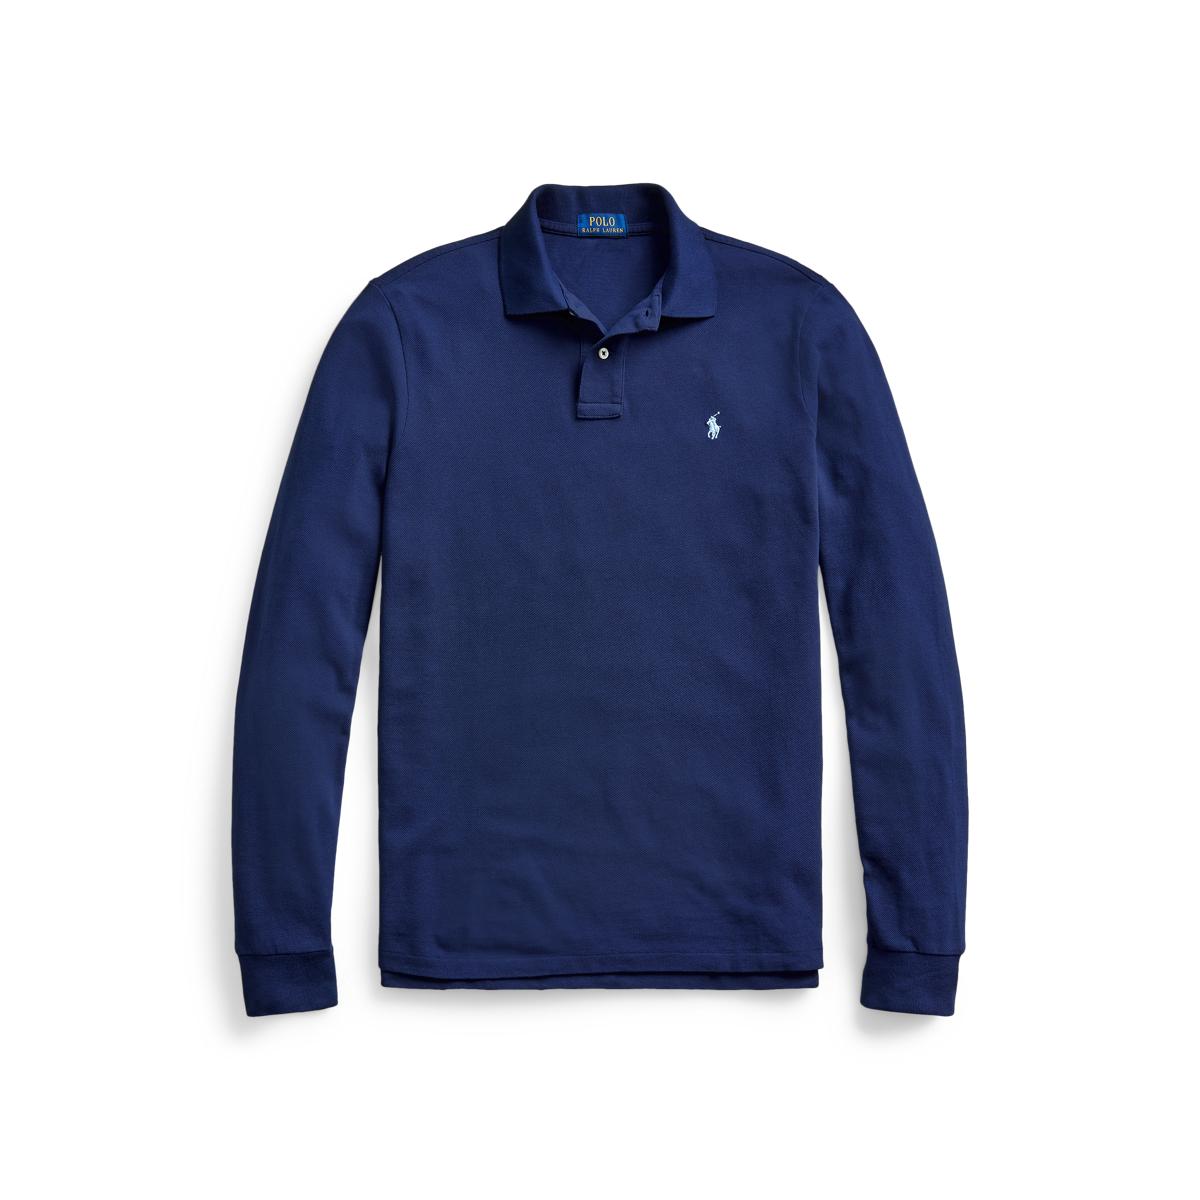 Ralph Lauren Men's Paris Polo Shirt Number 5 Custom Slim Fit Navy Blue Size XXL